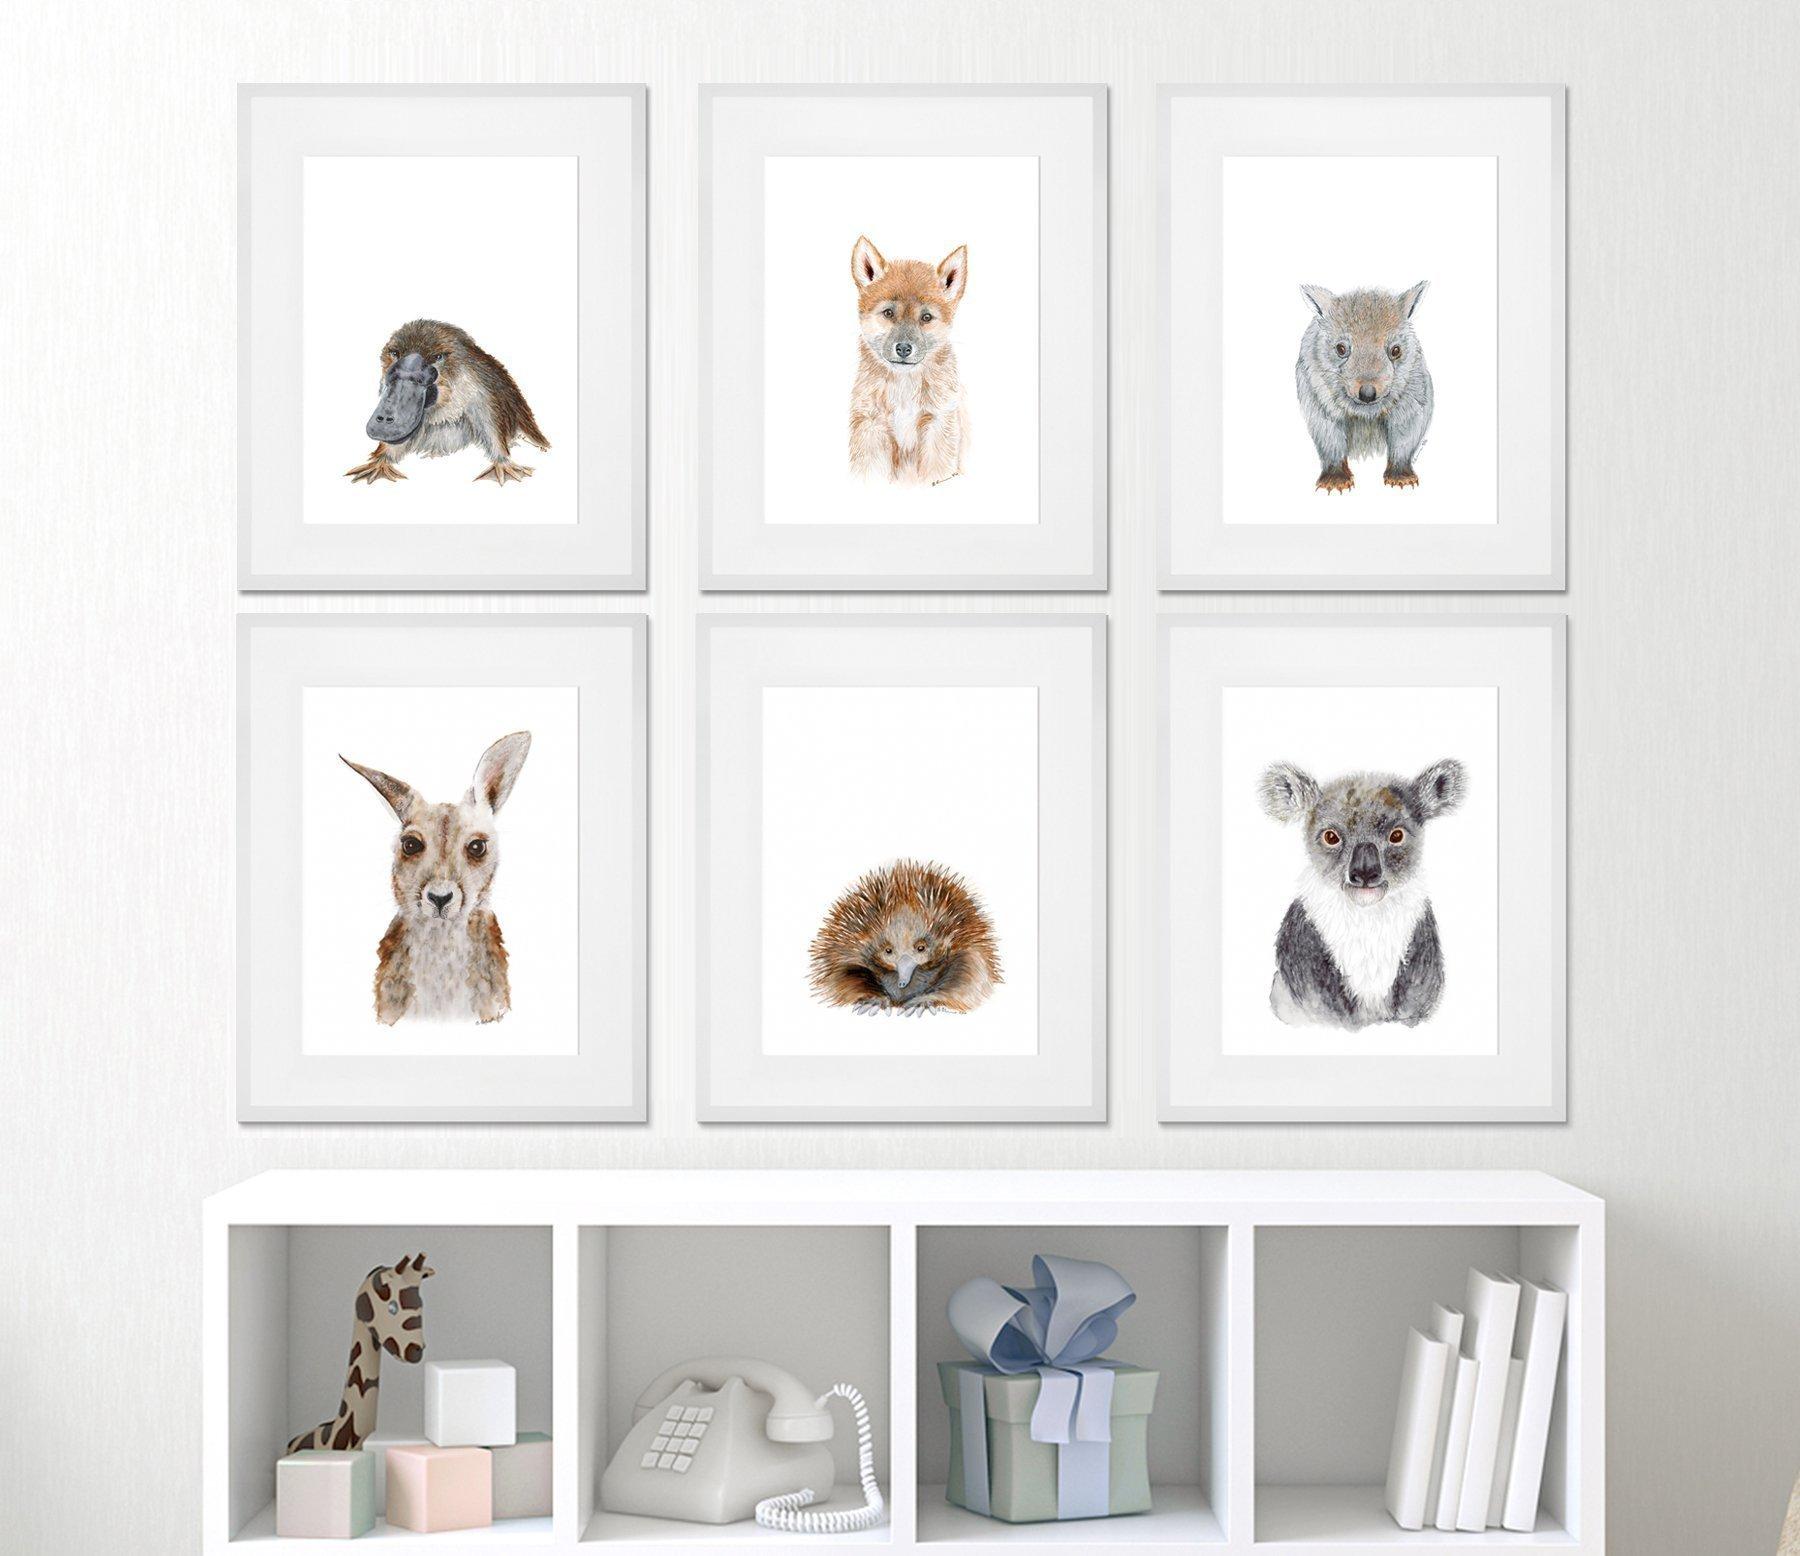 Set of Framed Aussie Animal Prints - Outback Nursery Prints - Framed Prints from Down Under - Animal Nursery - Girl Room Decor